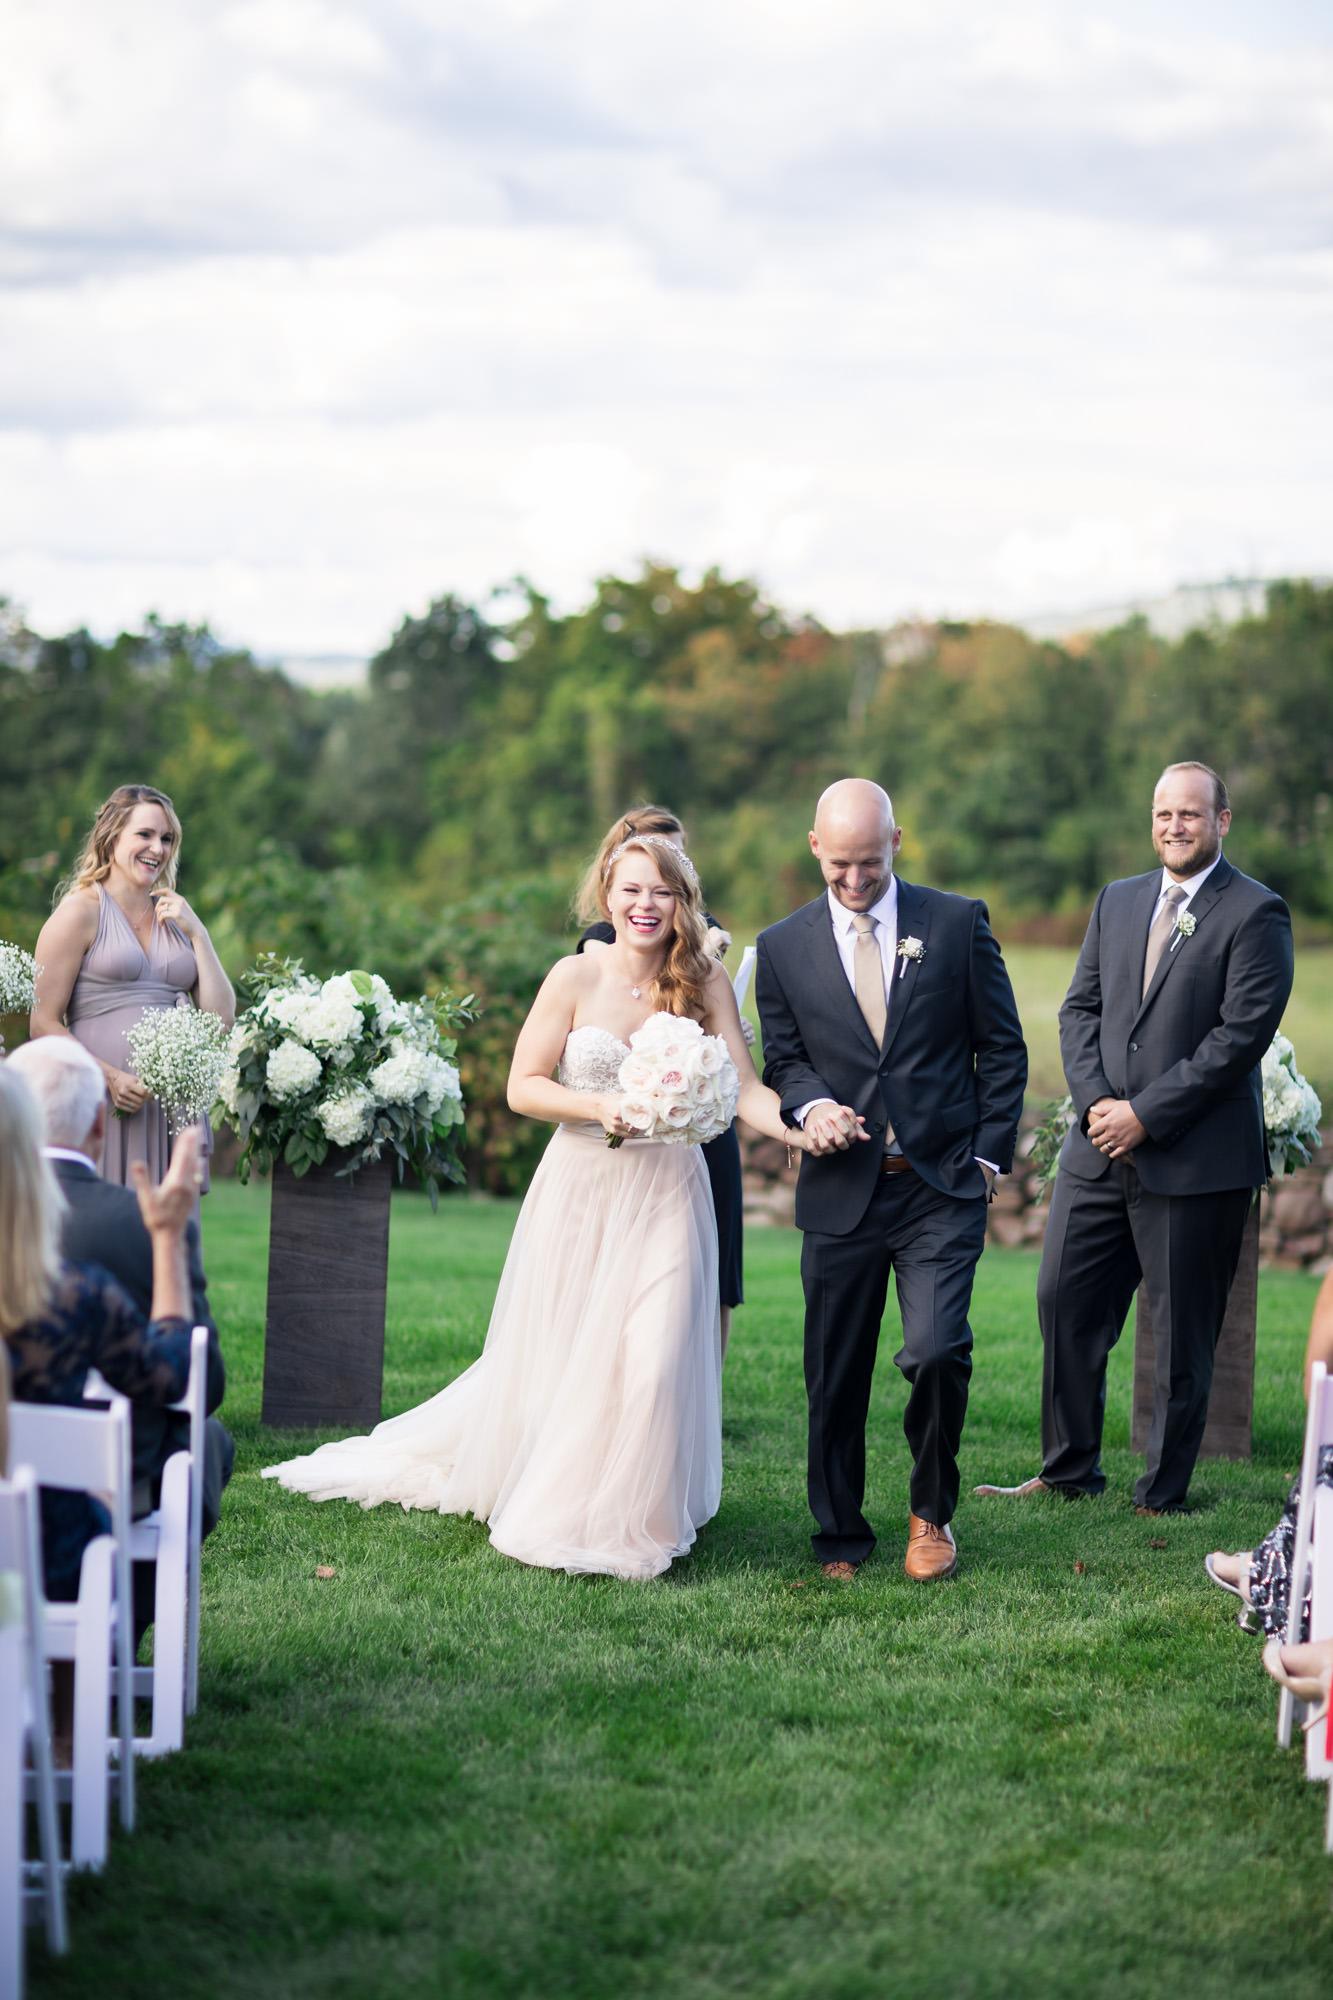 bride and groom walking ceremony